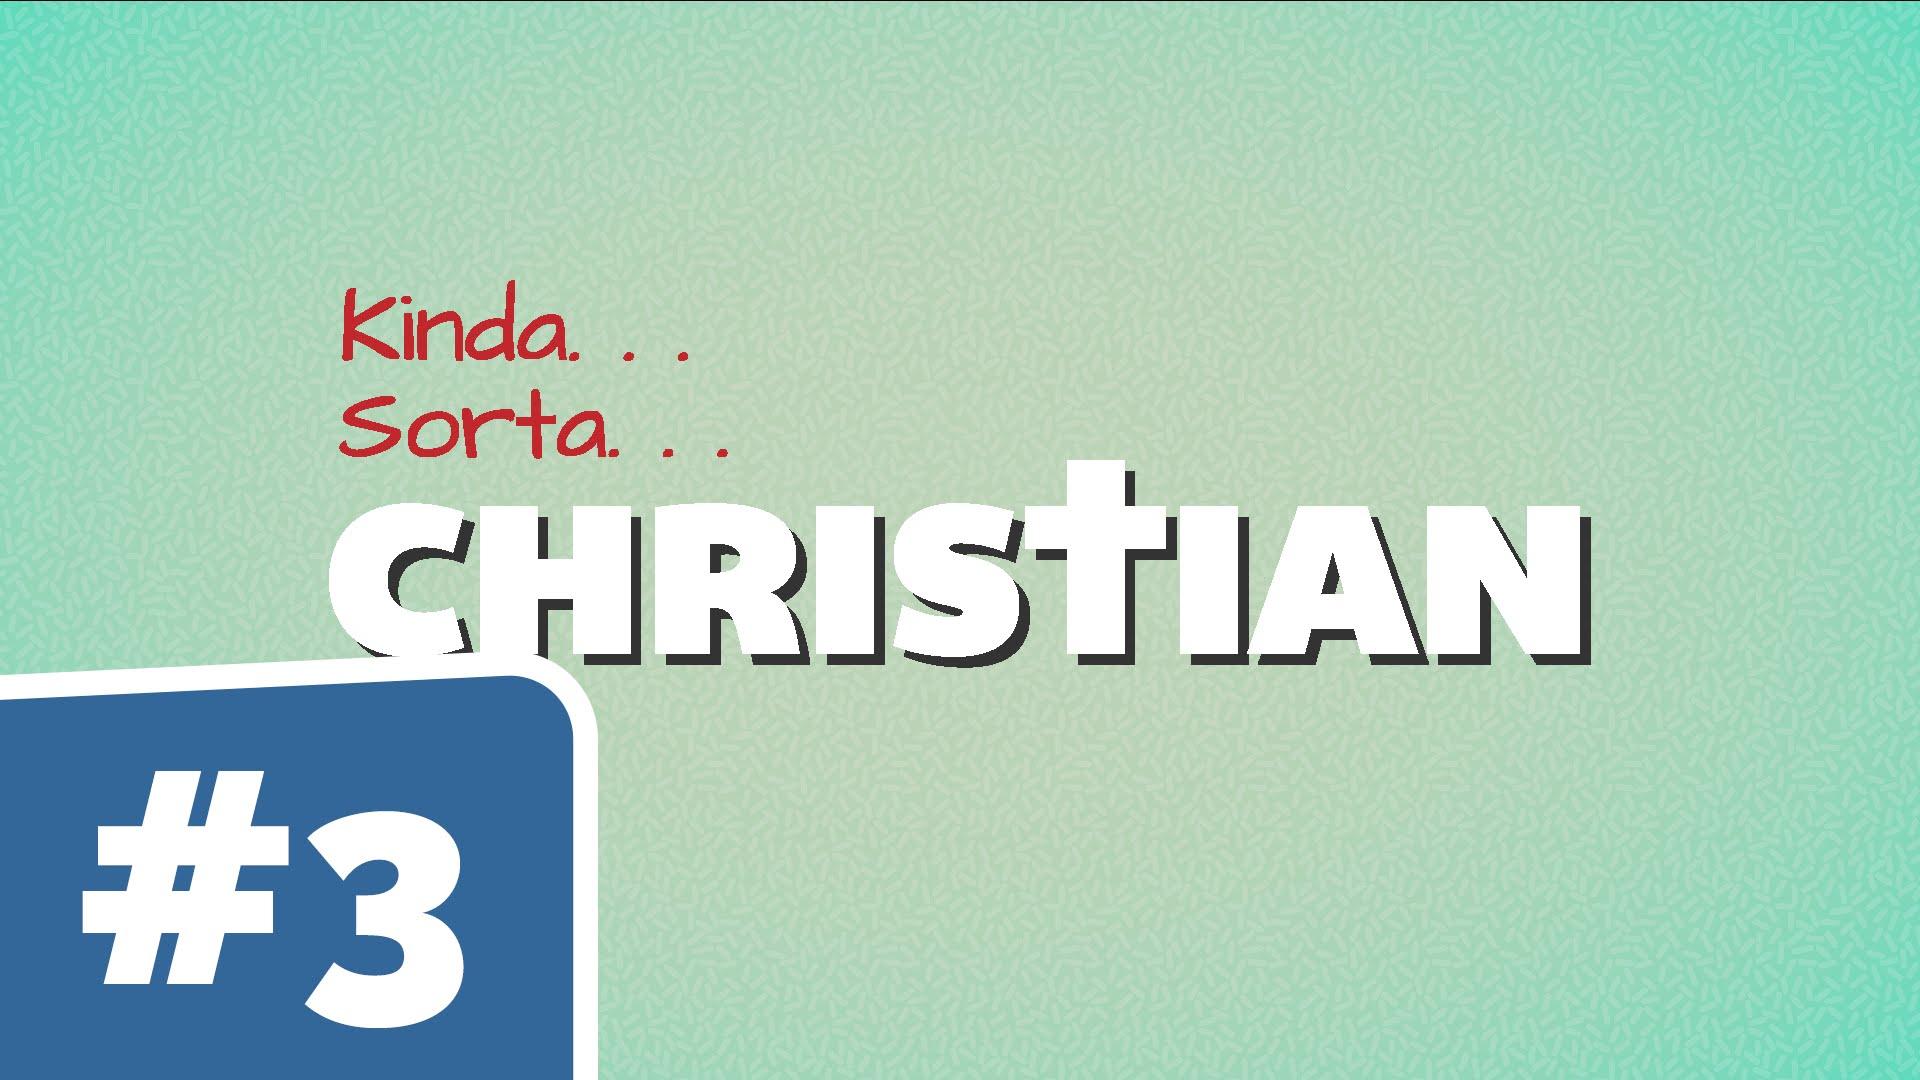 Kinda Sorta Christian: Don't Ask Me to Share My Faith (Youth)